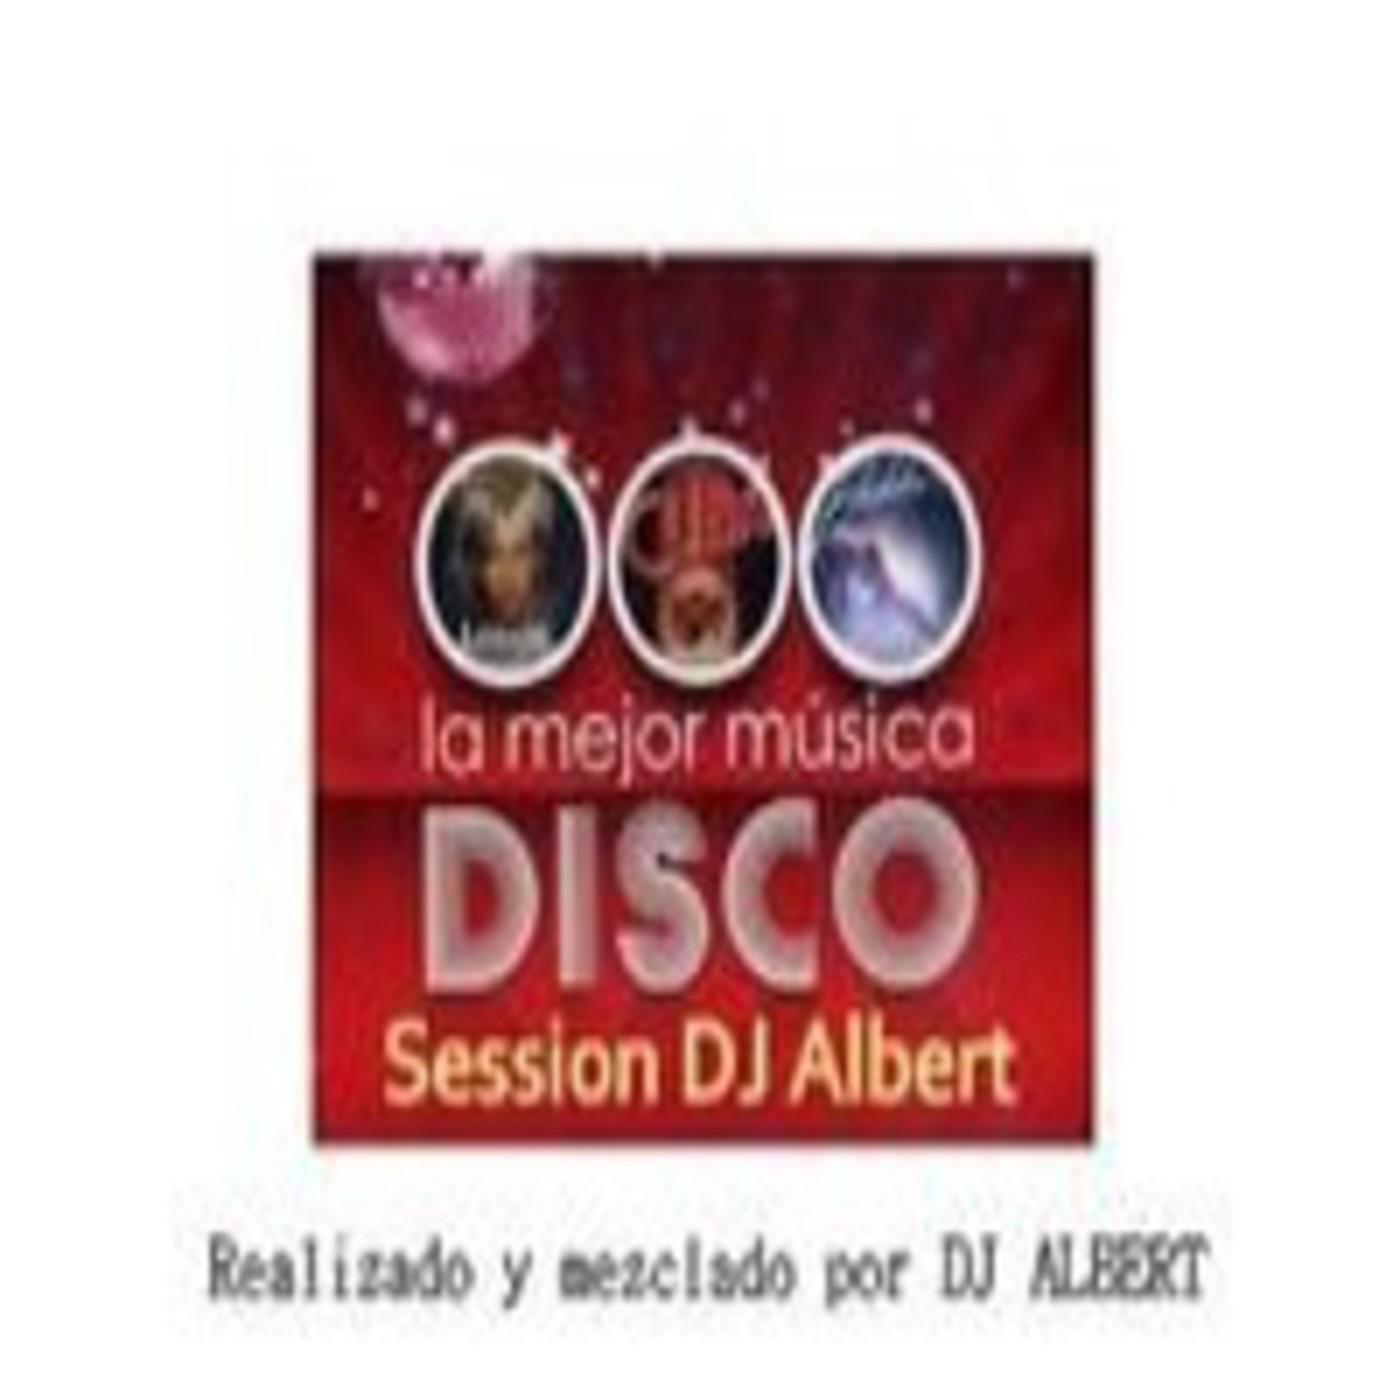 LO MEJOR DE LA MÚSICA DISCO Session DJ Albert